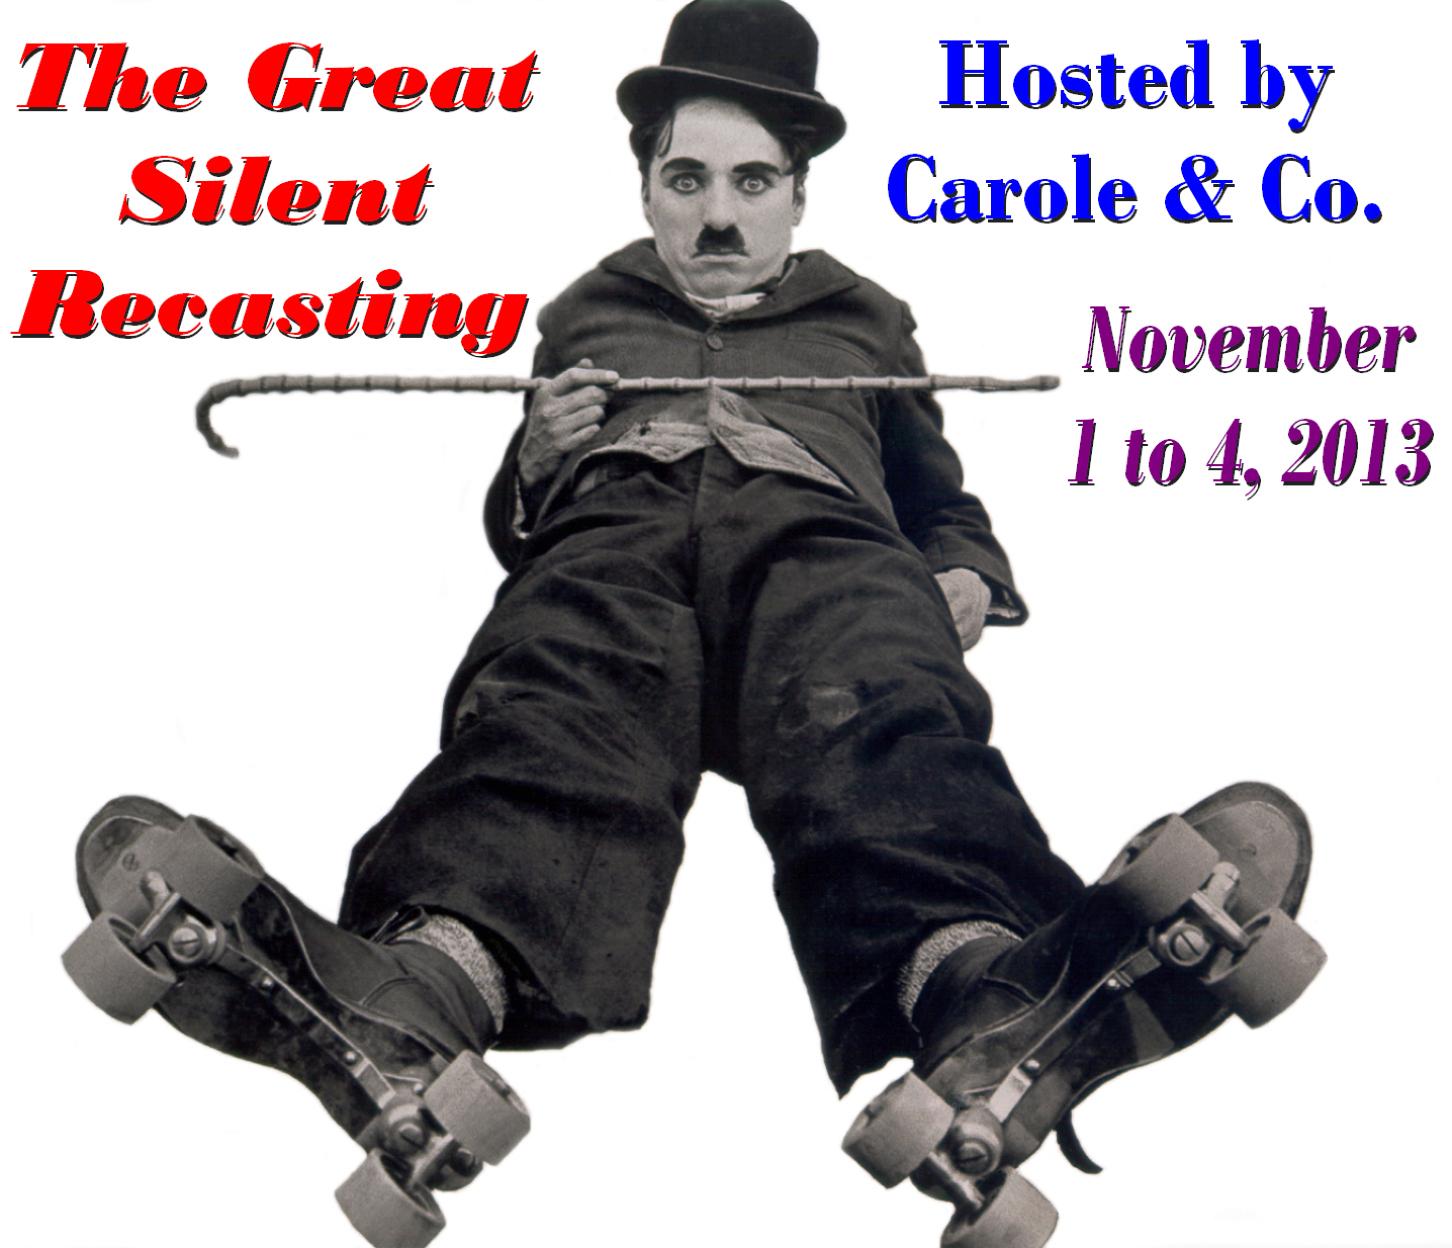 the great silent recasting 2013 charlie chaplin 00b